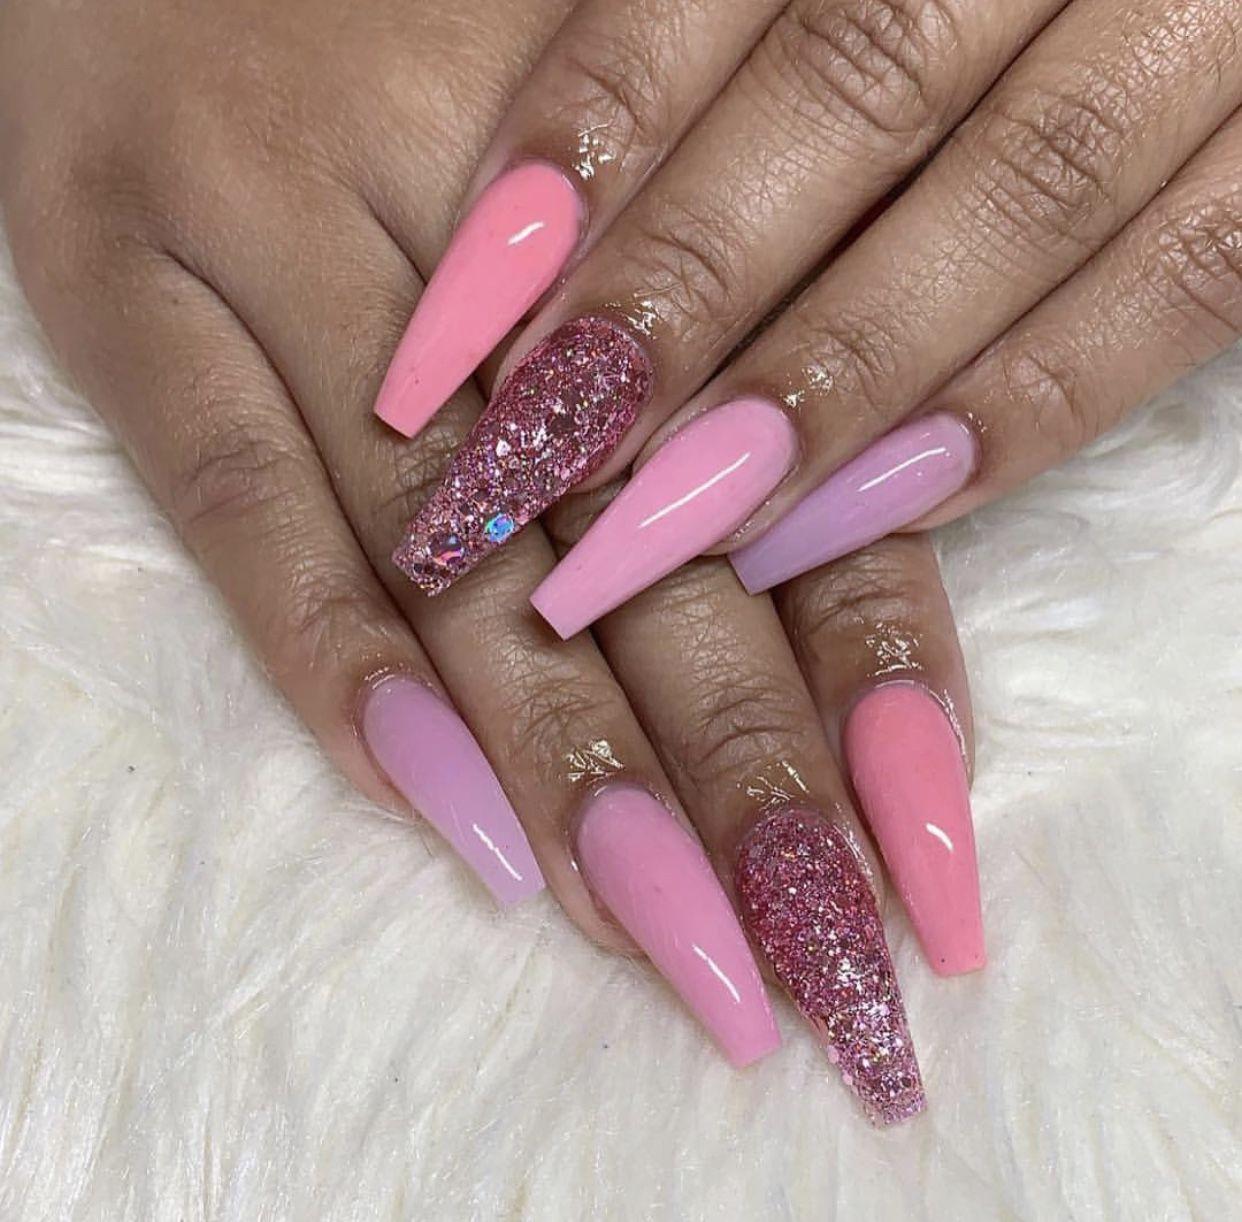 Pin By L E X I On N A I L S Pink Acrylic Nails Hair